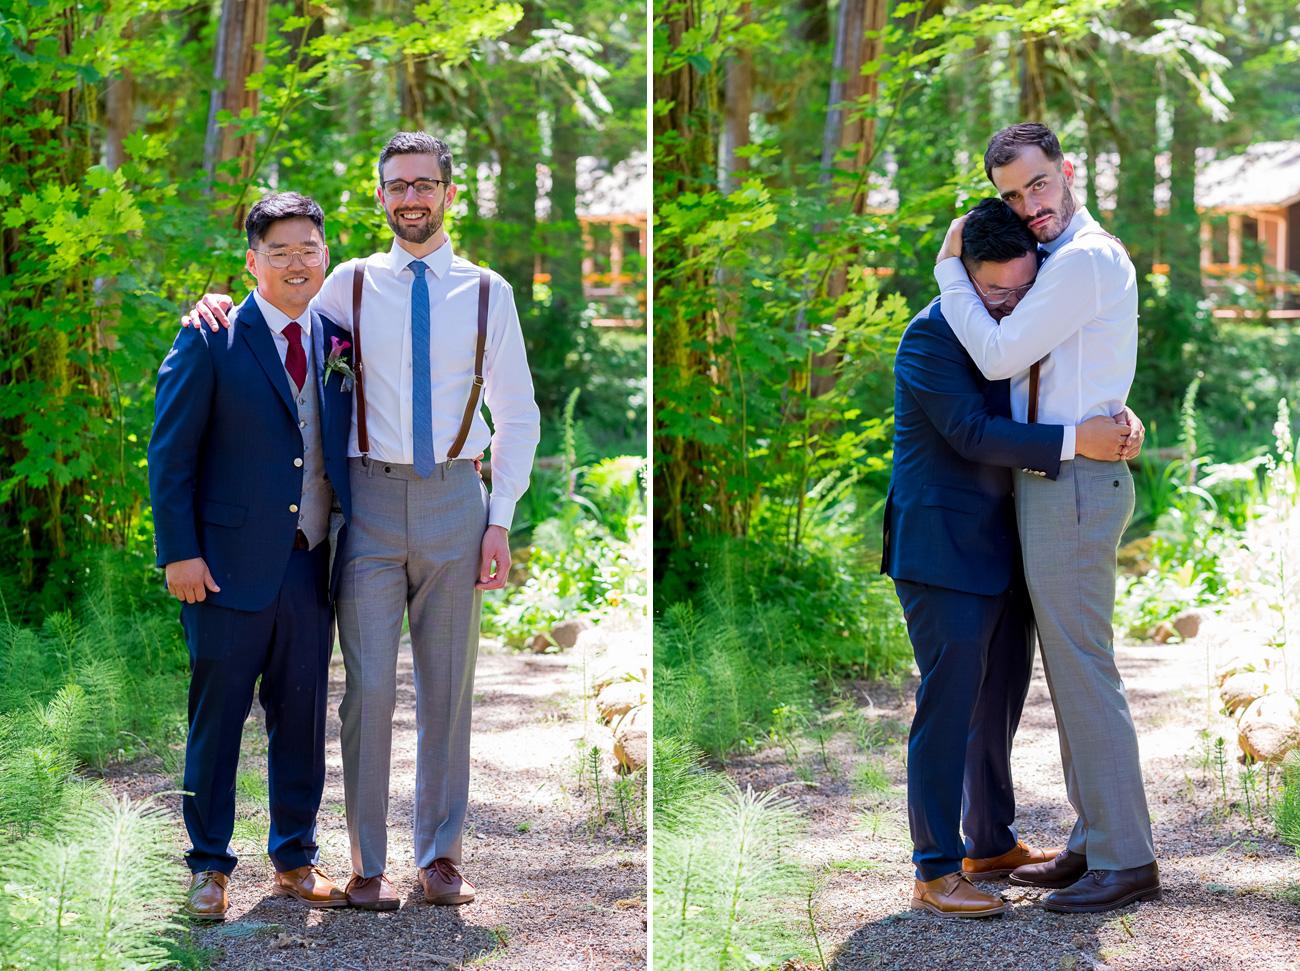 loloma-lodge-oregon-wedding-46 Loloma Lodge Oregon Wedding | Anna & Justin | Traditional Korean Tea Ceremony